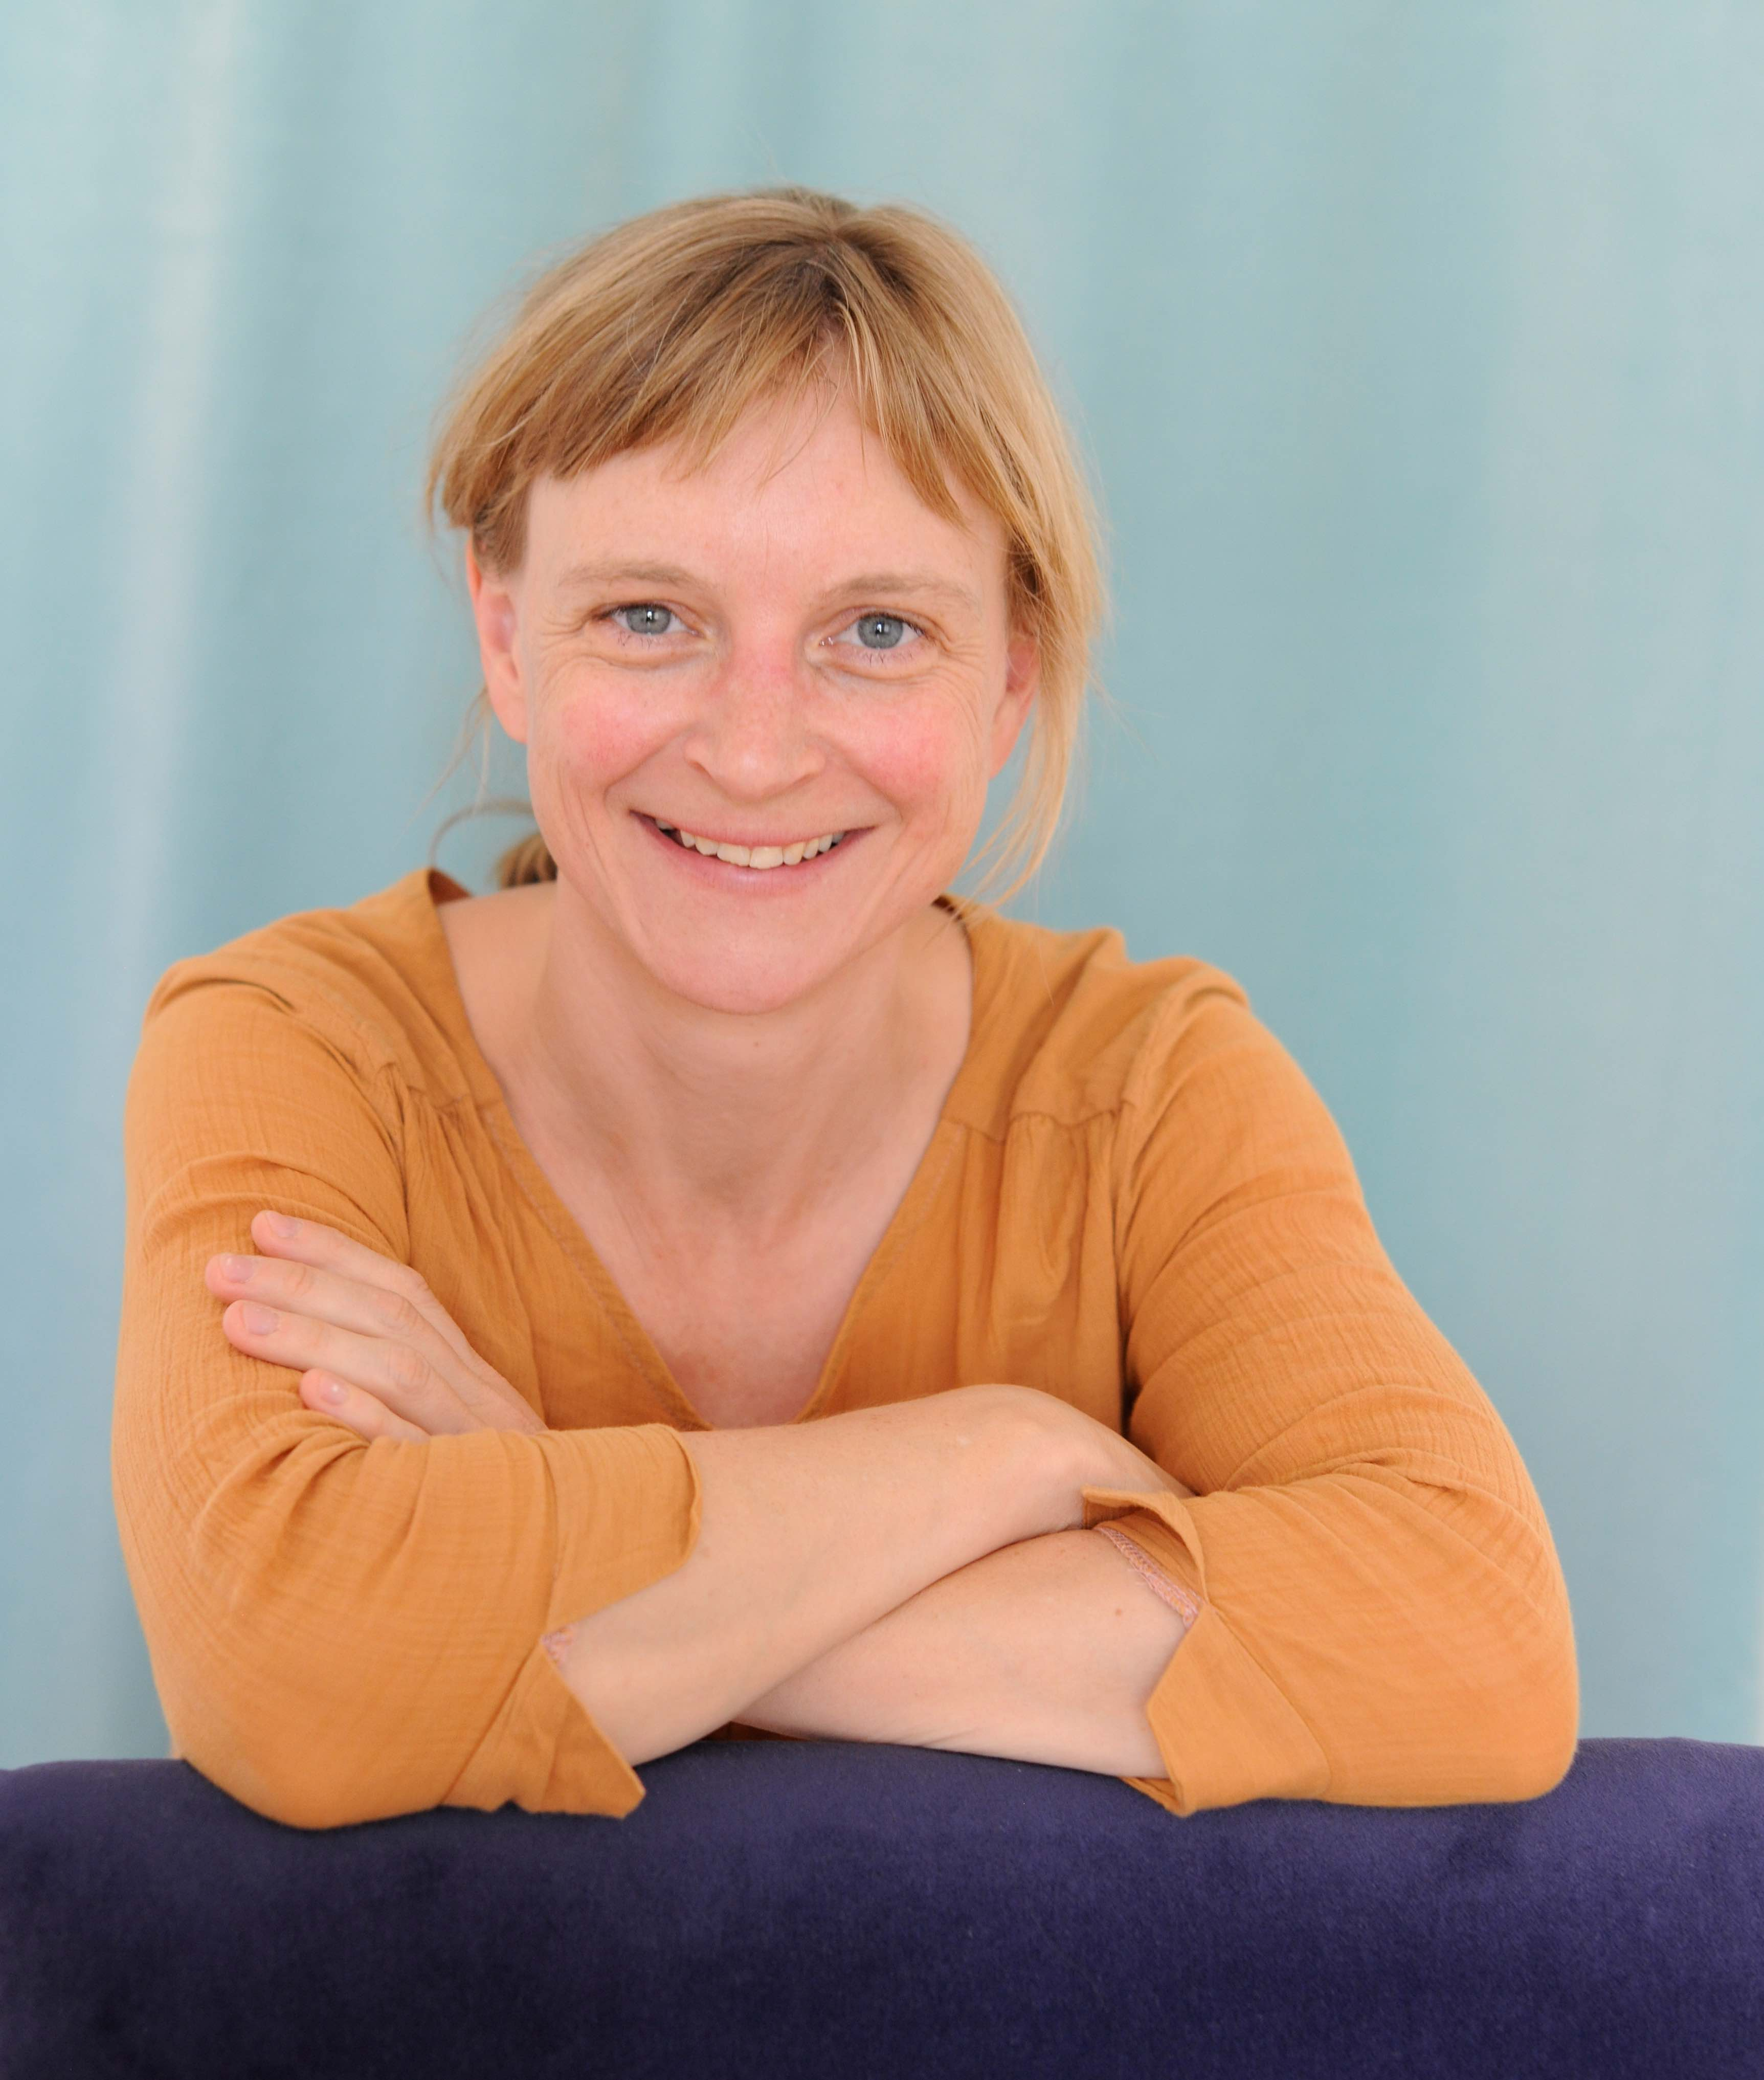 Julia Bonn Ganzheitliche Koerperarbeit Somatic Coaching Berlin